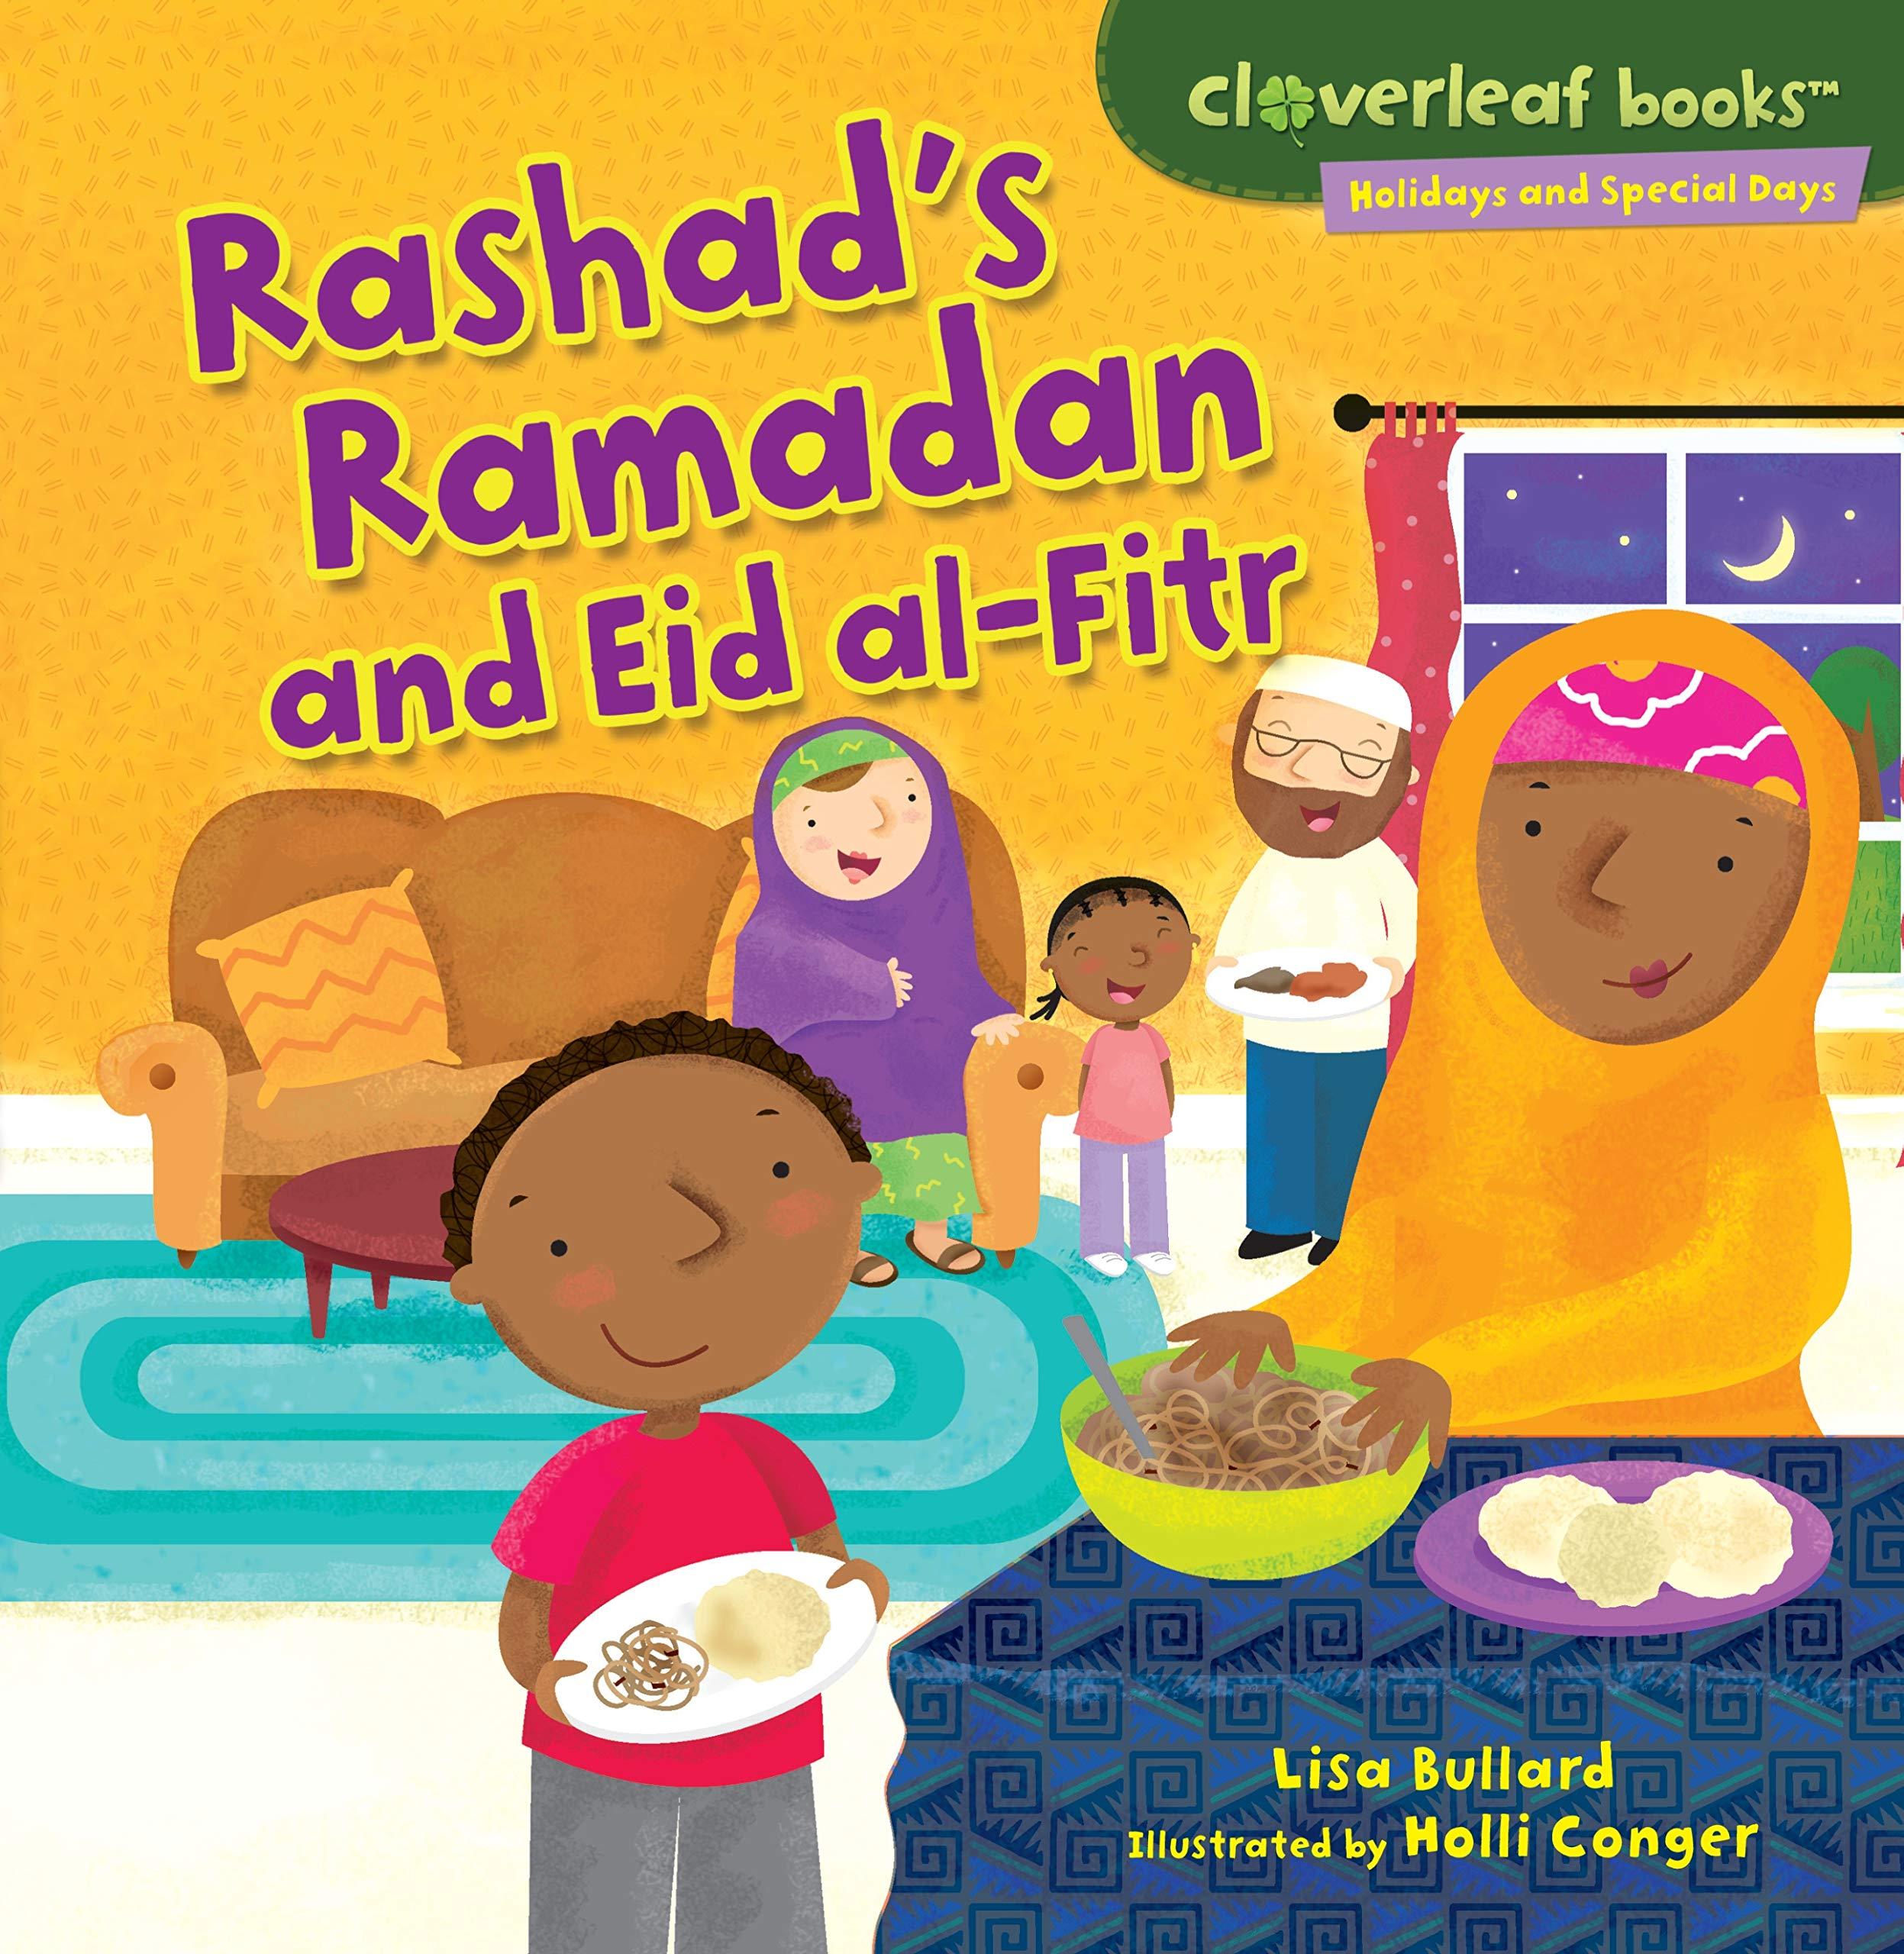 Rashad's Ramadan and Eid Al-Fitr (Cloverleaf Books - Holidays and Special Days) pdf epub